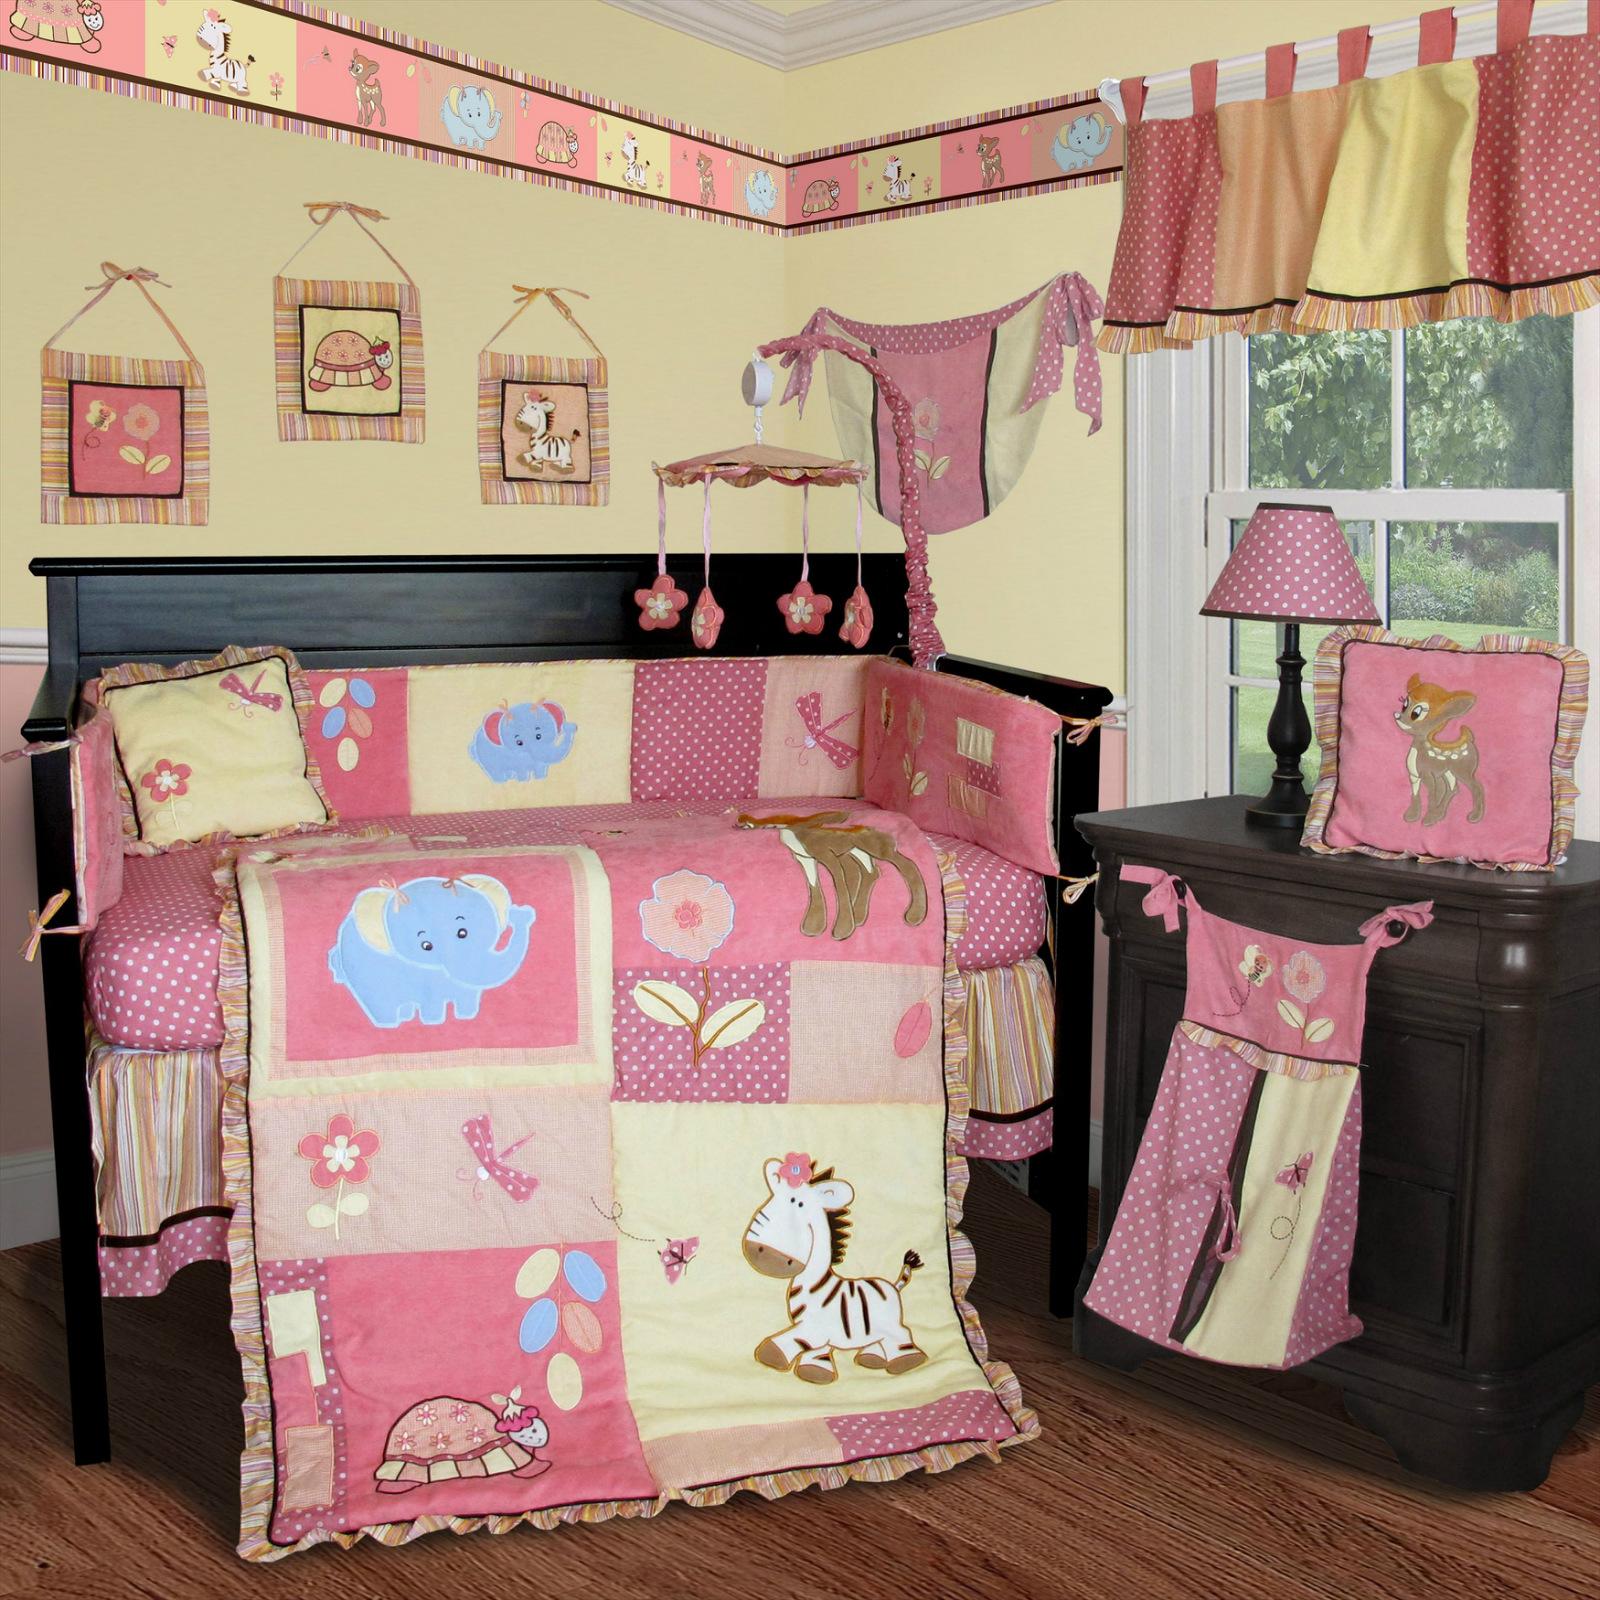 af97d51bfa6e0 SISI Custom Baby Bedding - Jungle Animal 14 PCS Crib Bedding Set incl.  Music Mobile